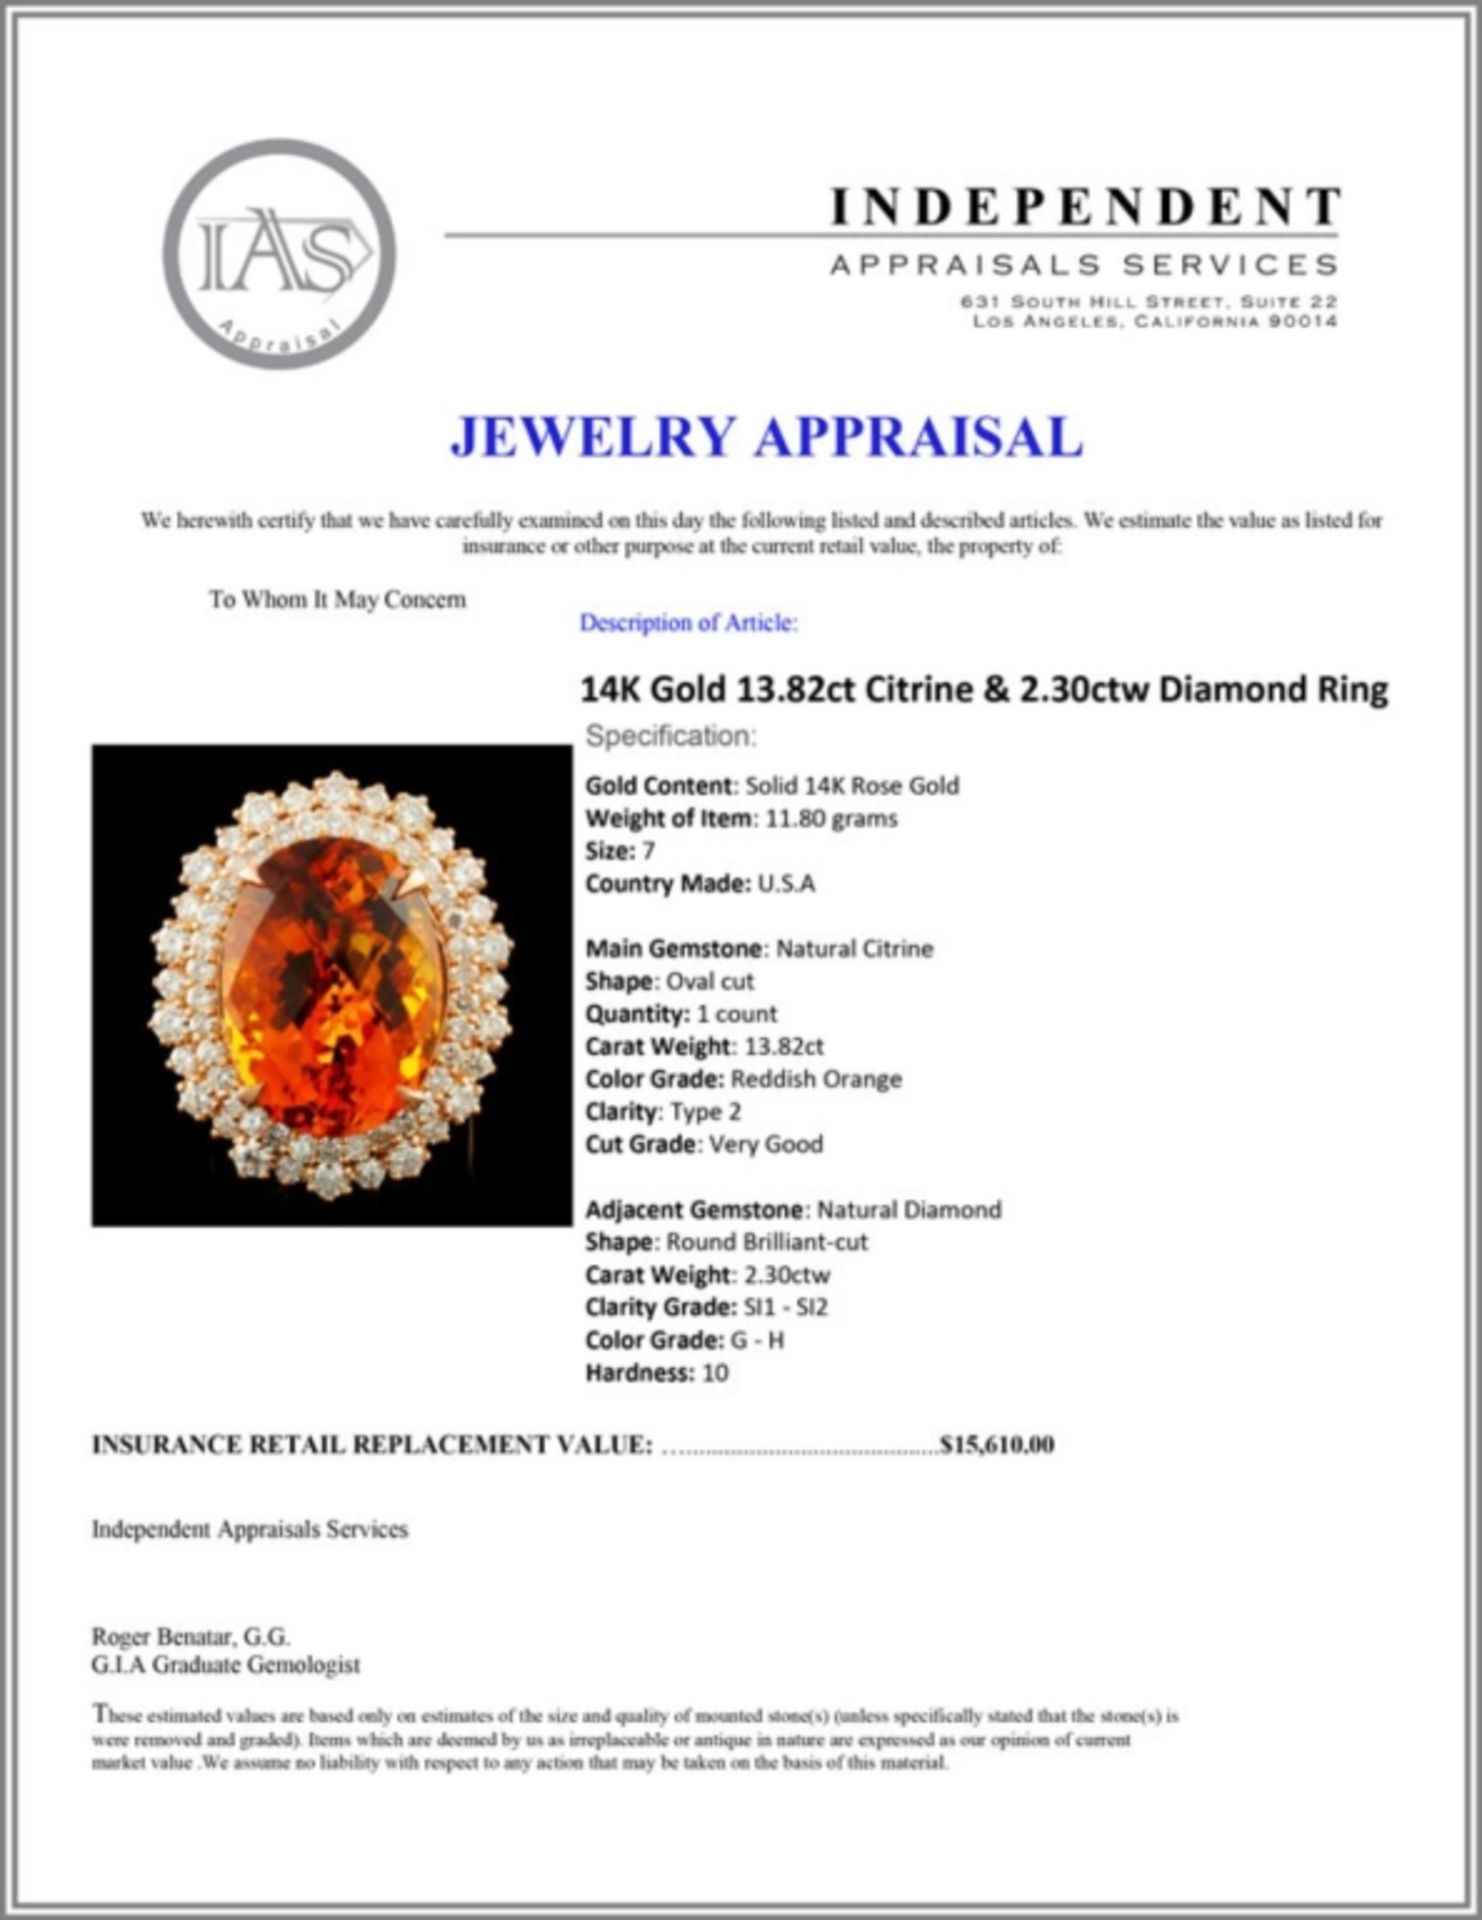 14K Gold 13.82ct Citrine & 2.30ctw Diamond Ring - Image 5 of 5